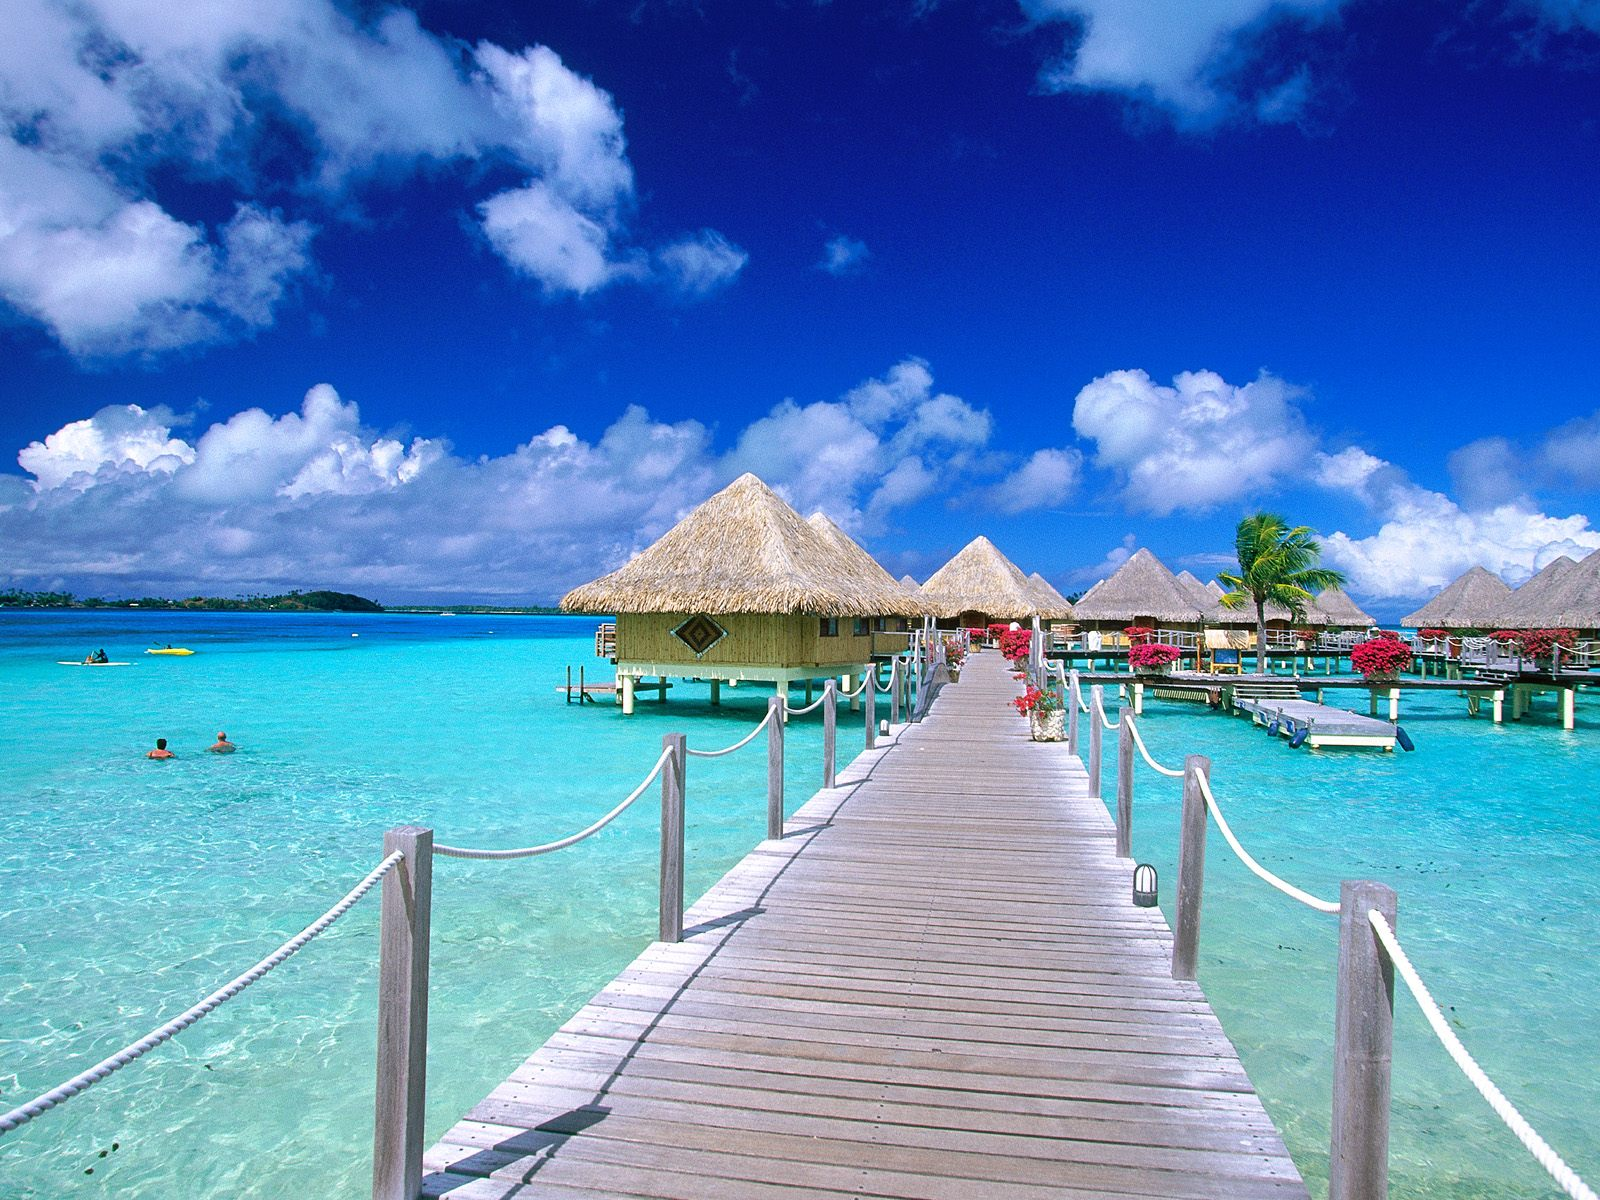 25 Tropical Beach Scenes Wallpapers Best Design Options 1600x1200